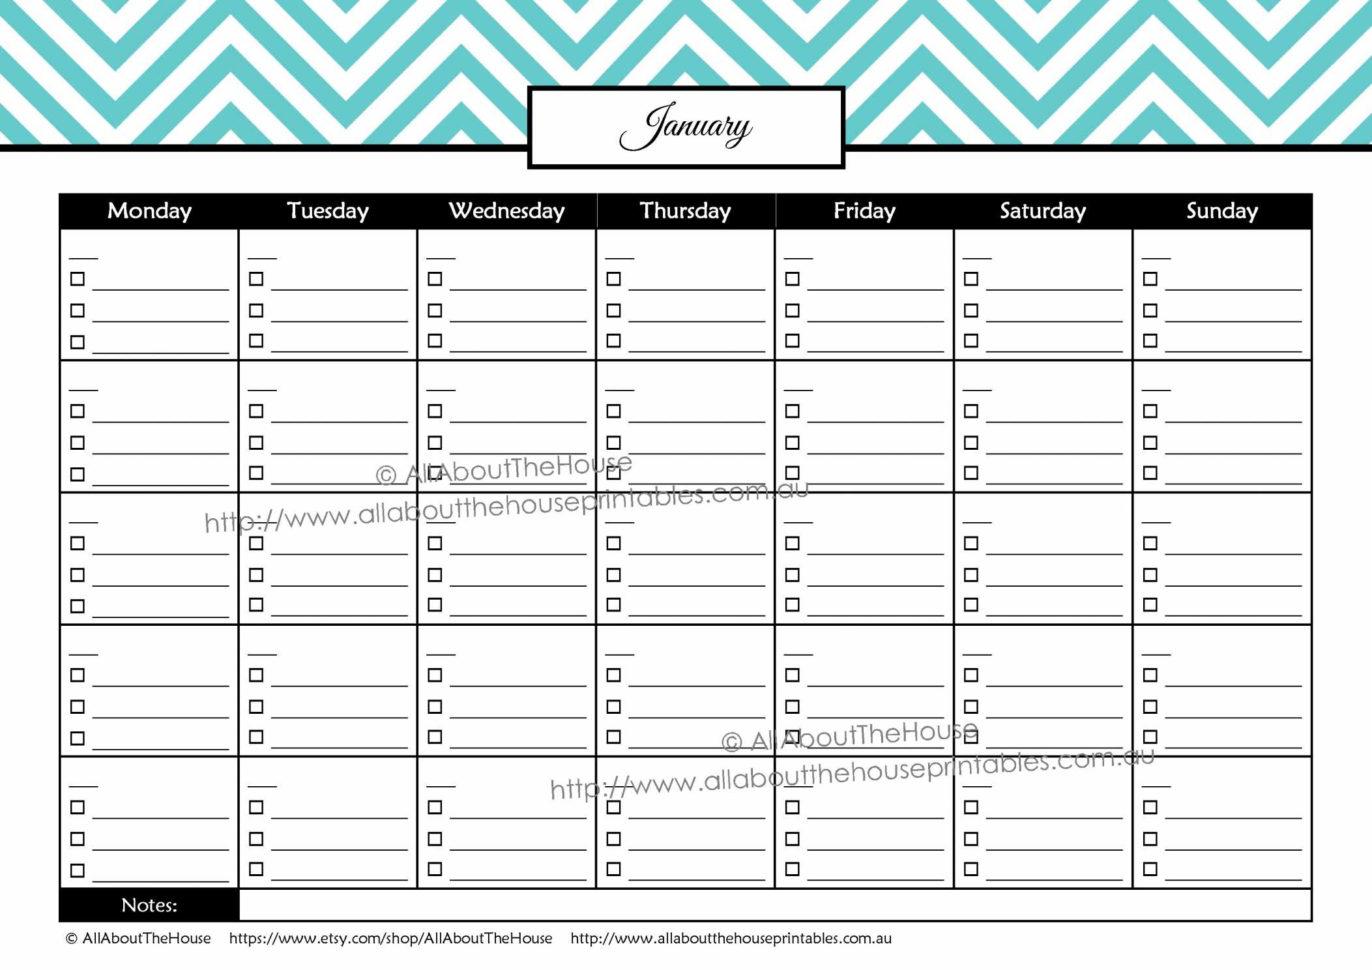 free budget calendar spreadsheet budget calendar spreadsheet budget calendar templates  Budget Calendar Spreadsheet With Regard To Budget List For Bills Template Bill Pay Calendar Free Budget Calendar Spreadsheet Printable Spreadshee